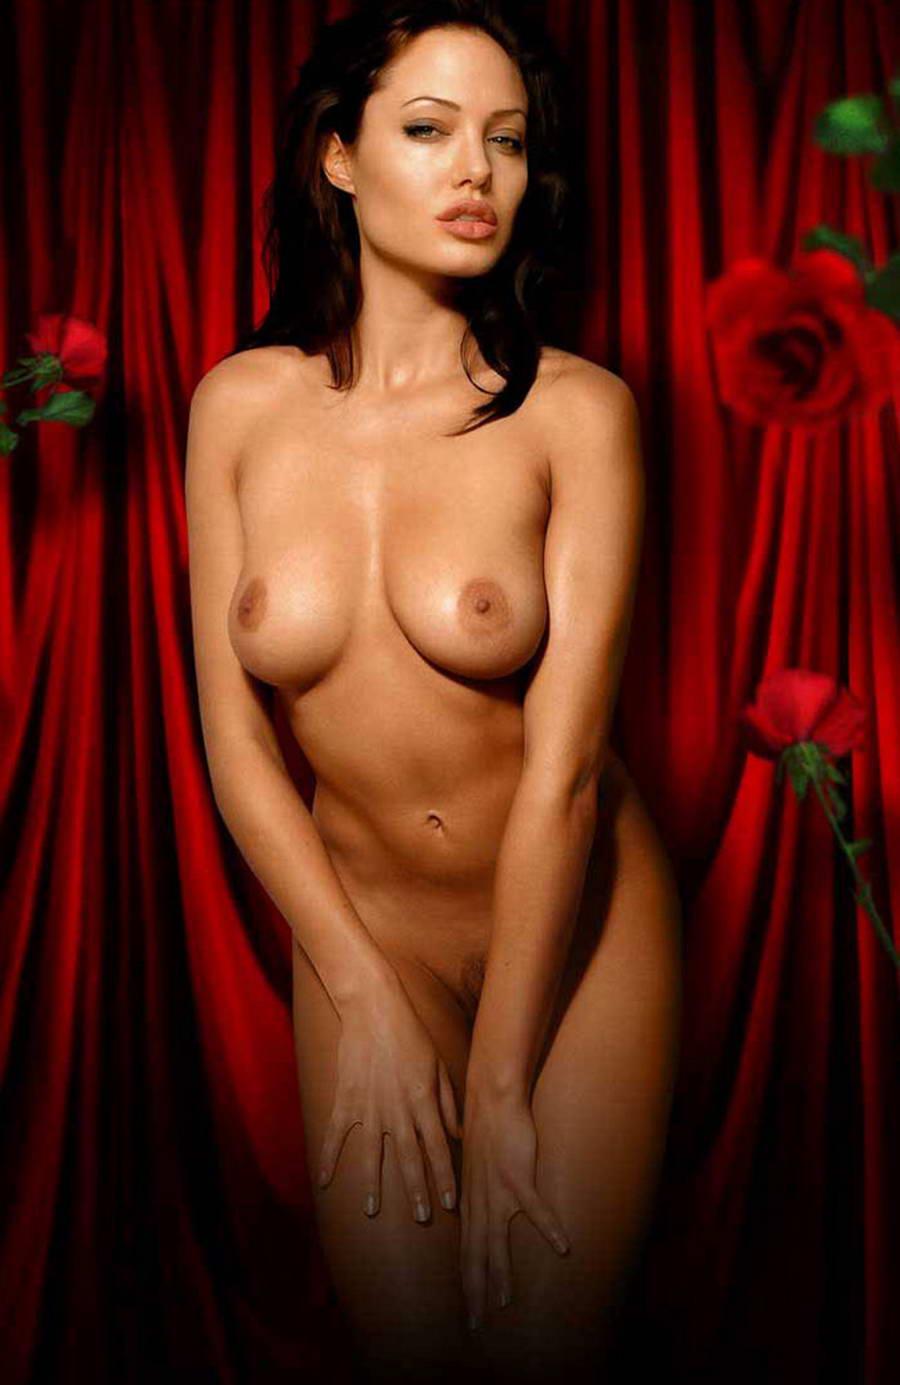 Angelina Jolie Naked Taking Lives anjelina jolie naked boobs . sex archive. comments: 3